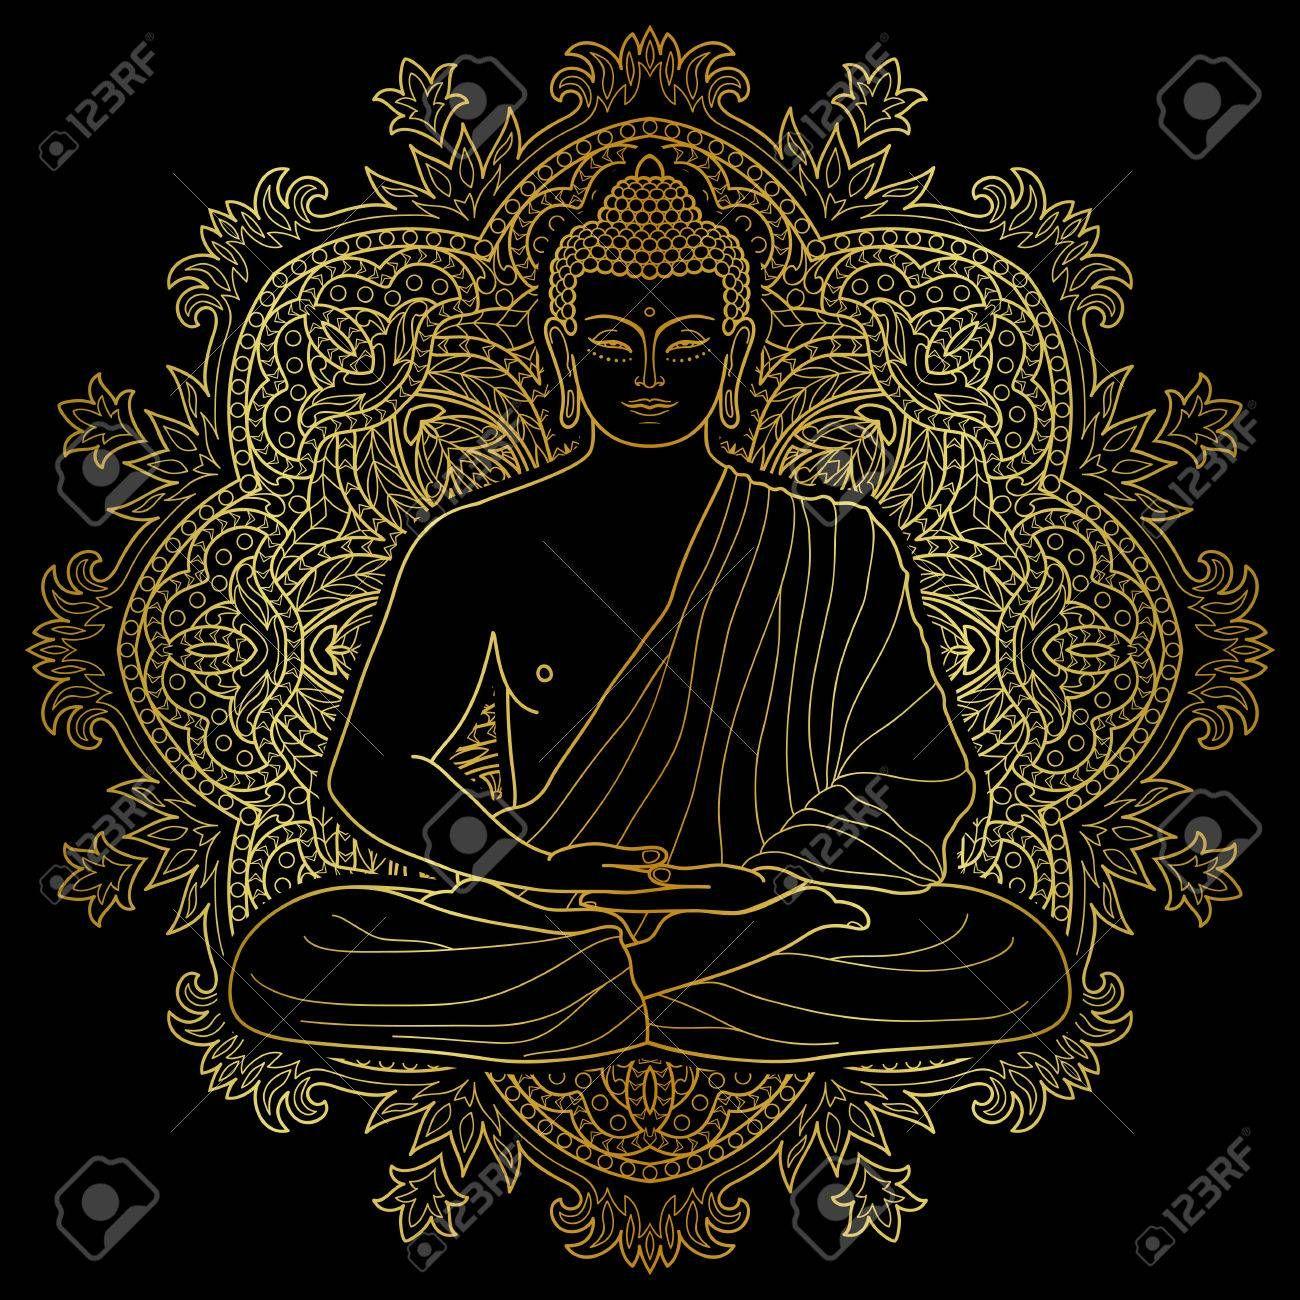 Mandala Buddha Head Men/'s Tee Image by Shutterstock